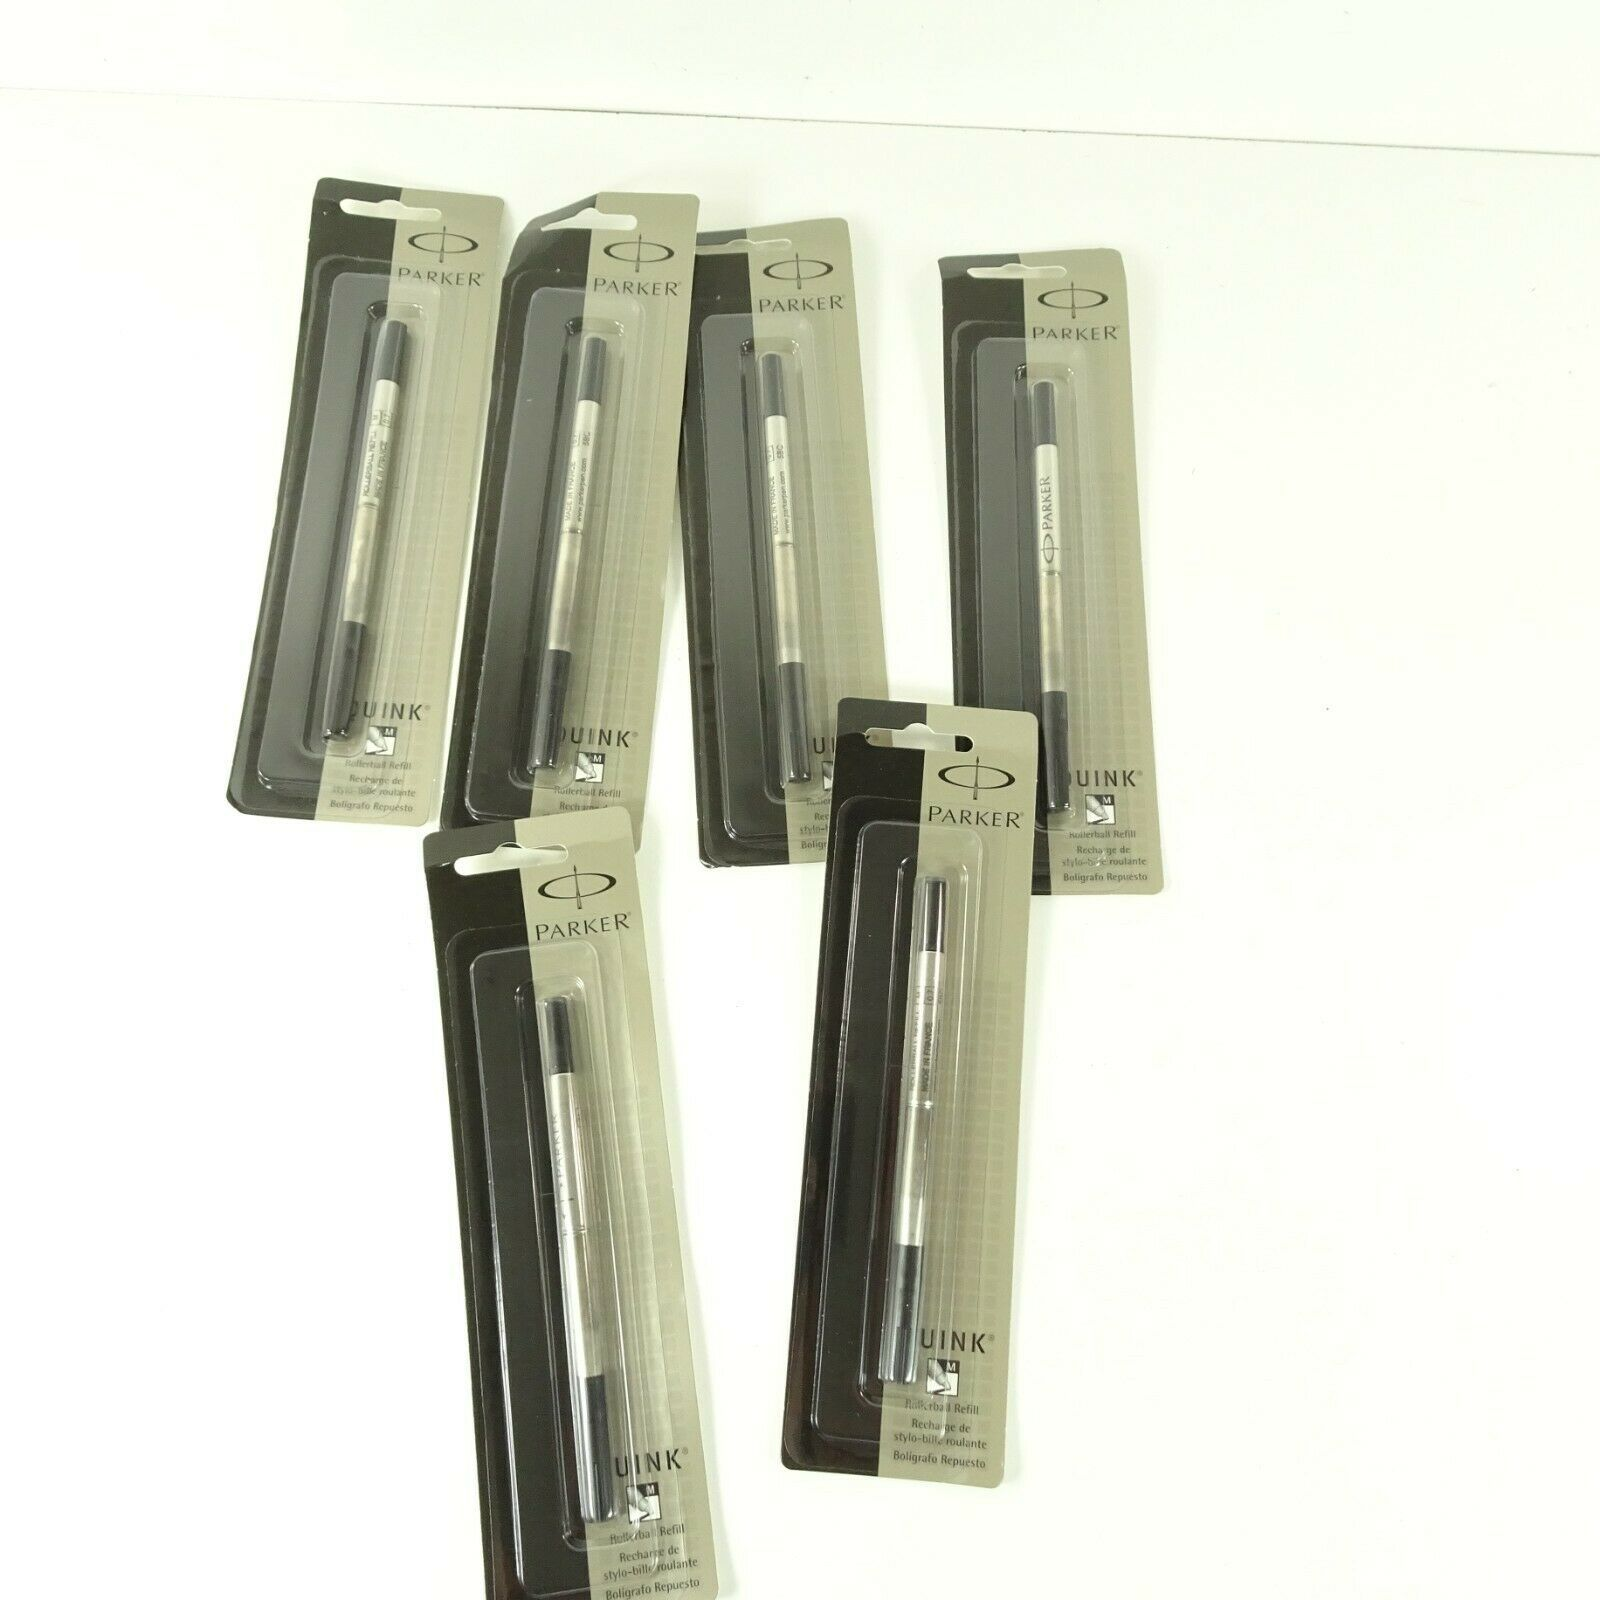 Lot of 6 Parker Quink Permanent Ink Refill Cartridges Roller  Medium Point, B - $26.99